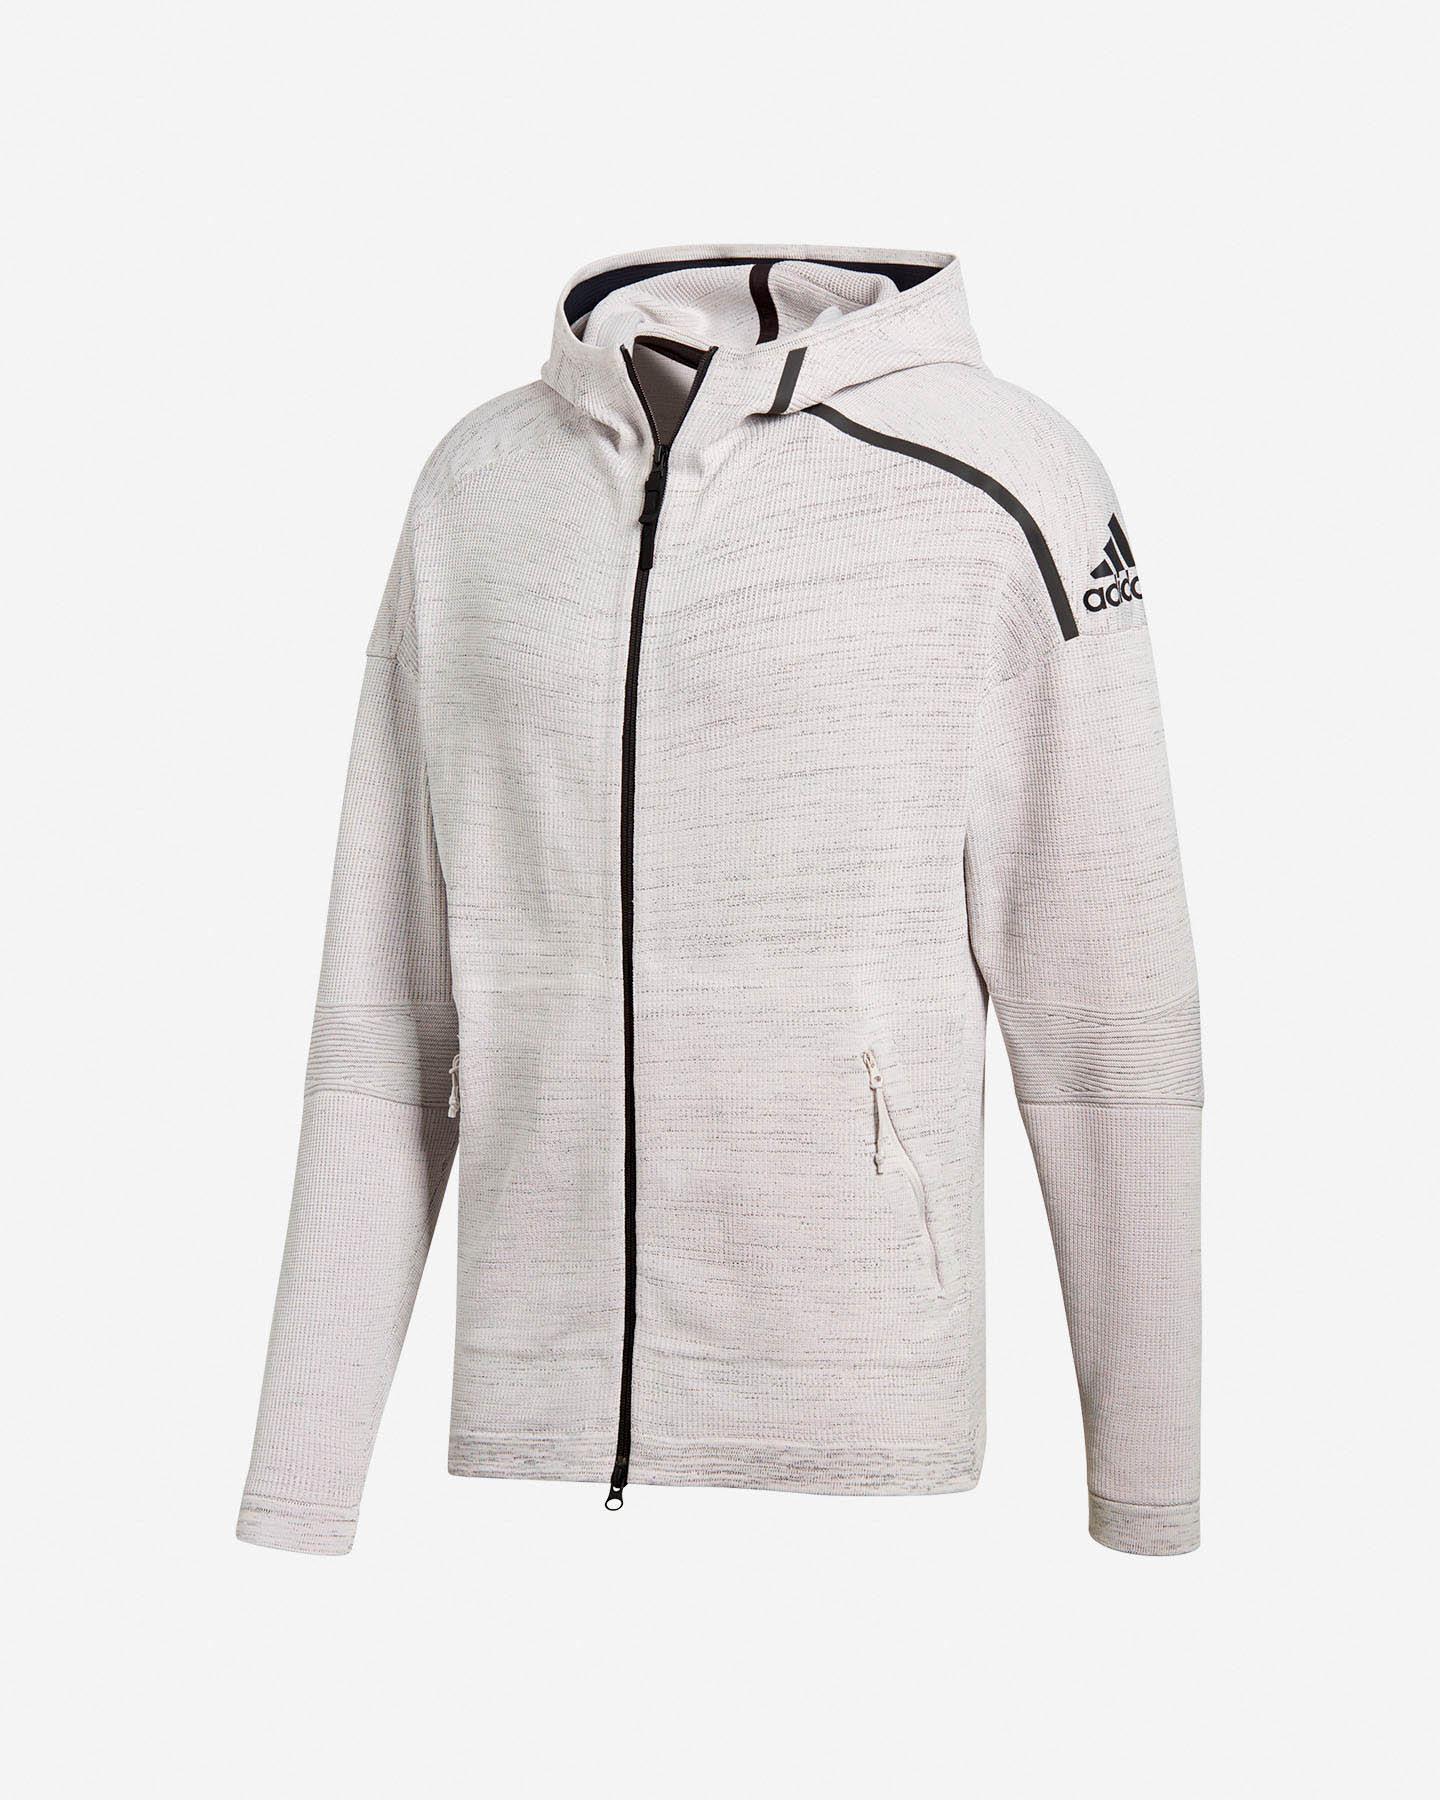 felpa adidas uomo 2017 grigio